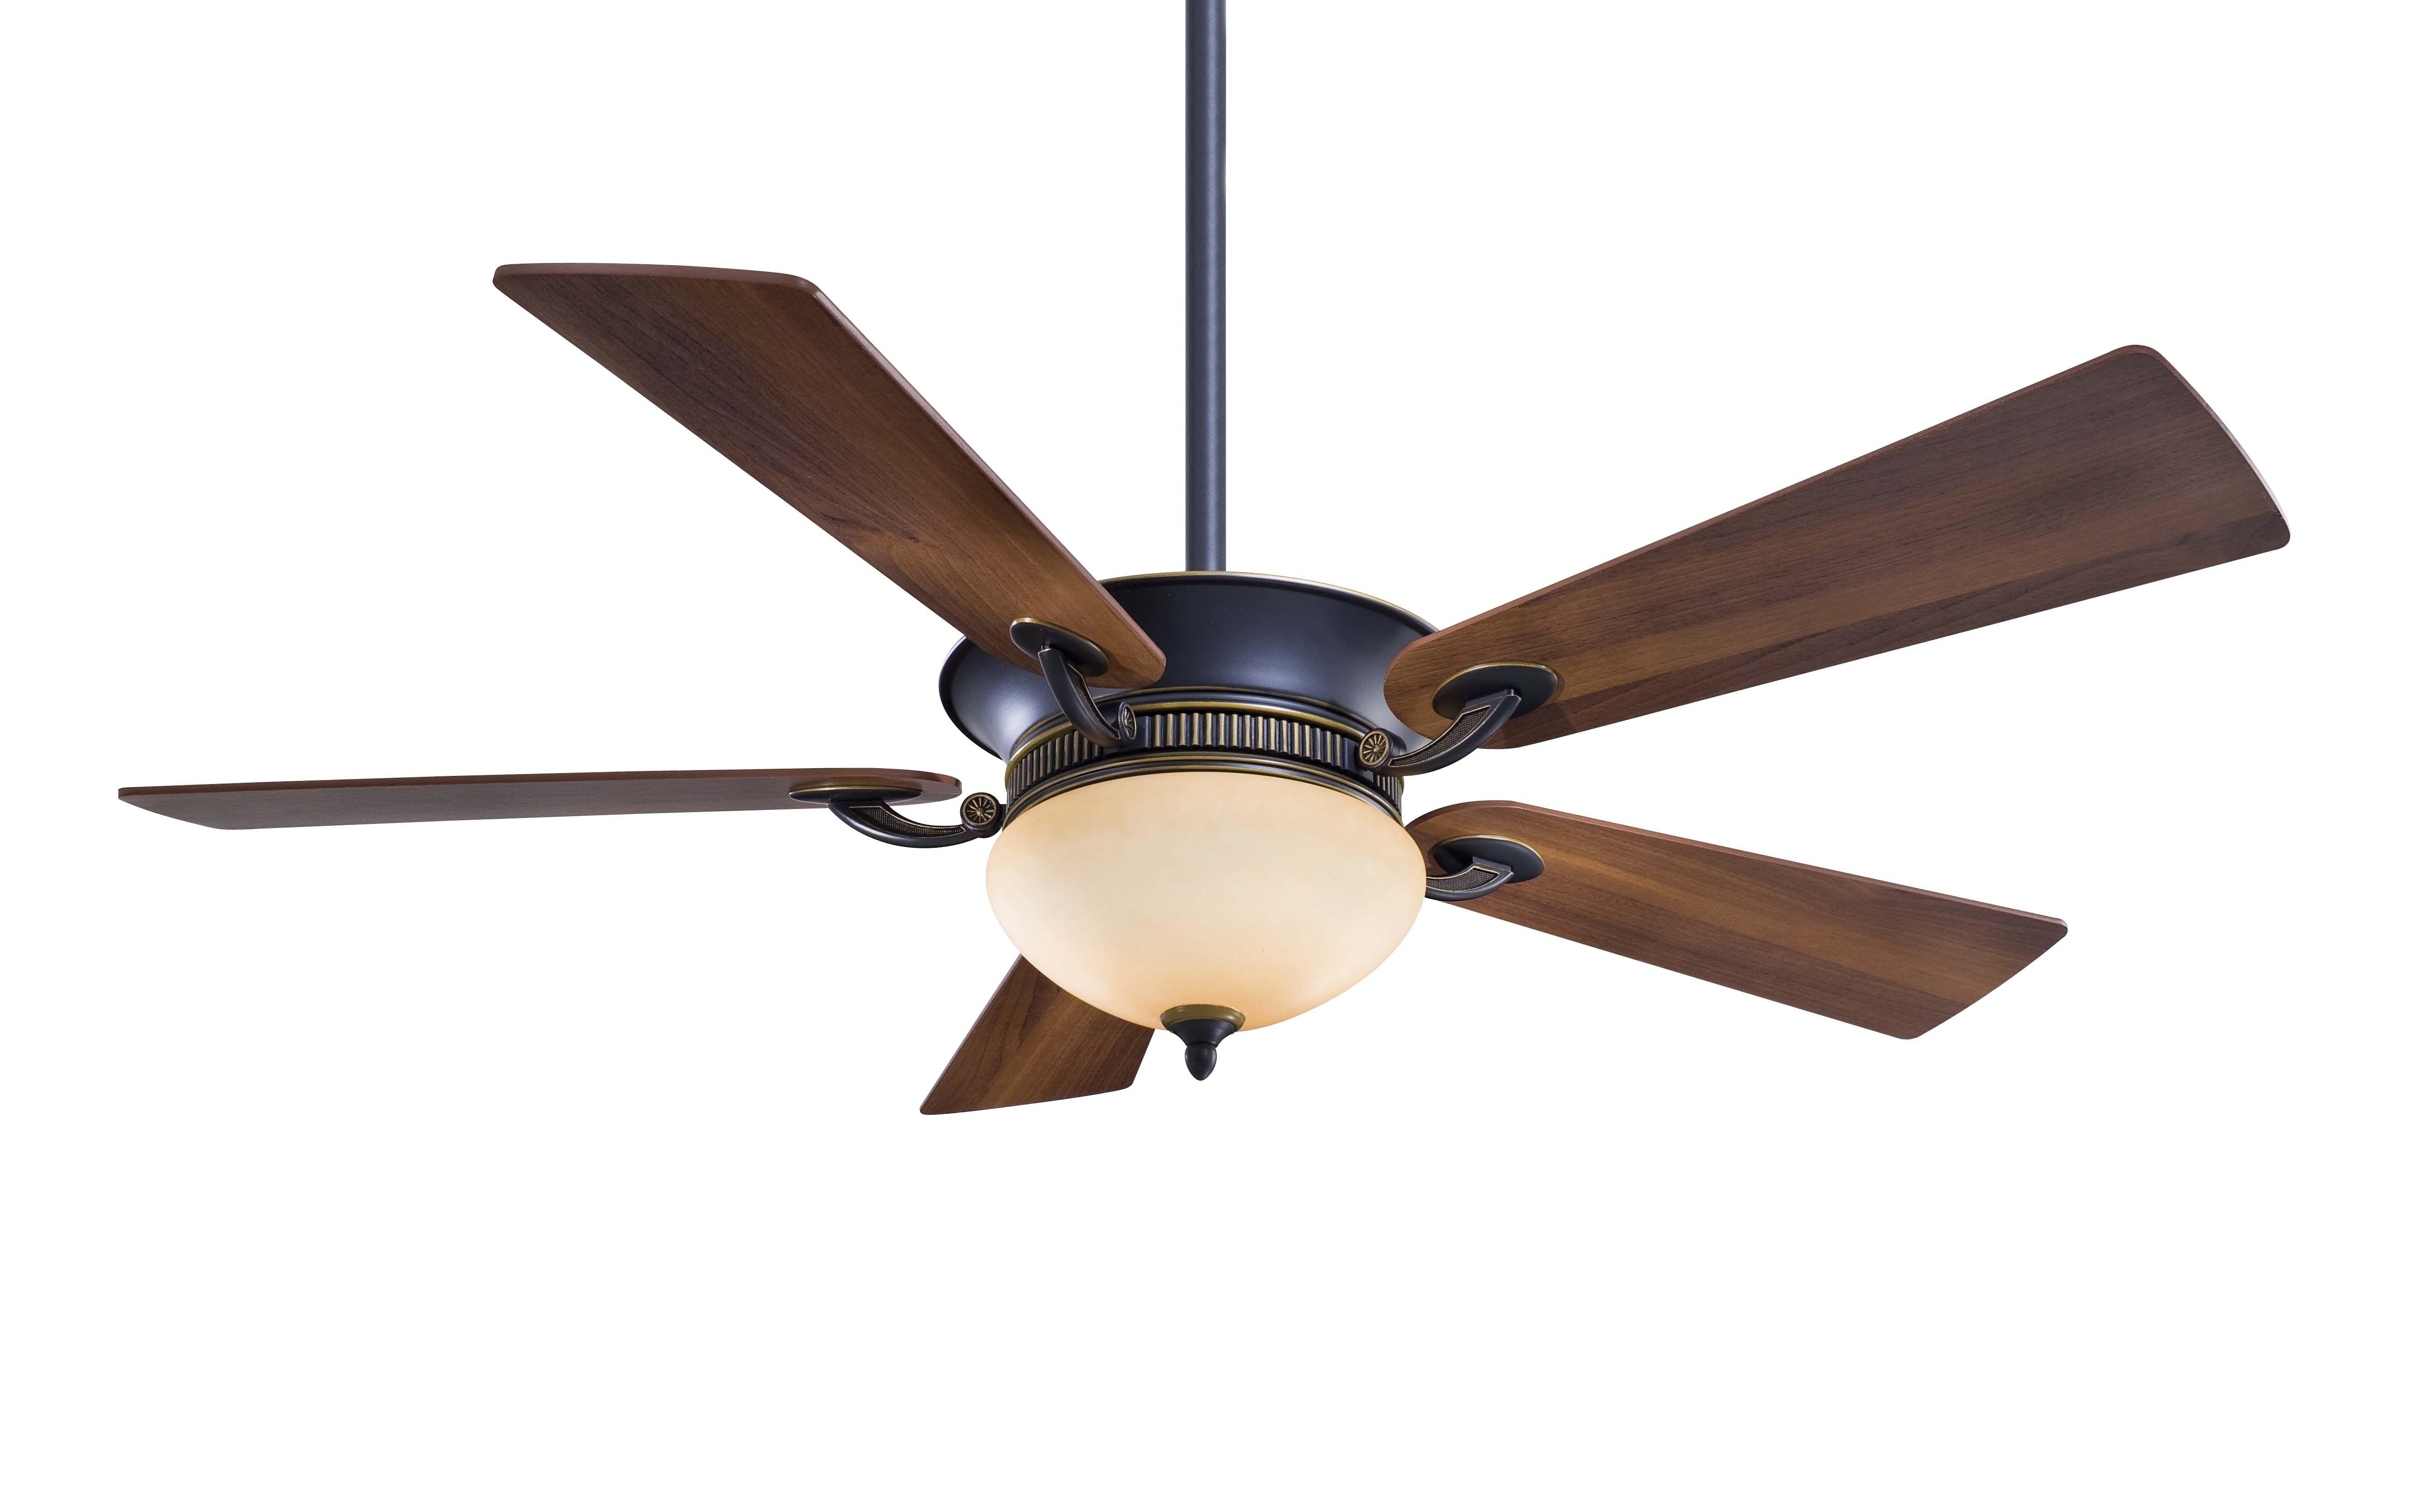 Delano Fan With Images Ceiling Fan Minka Aire Ceiling Fan Led Ceiling Fan